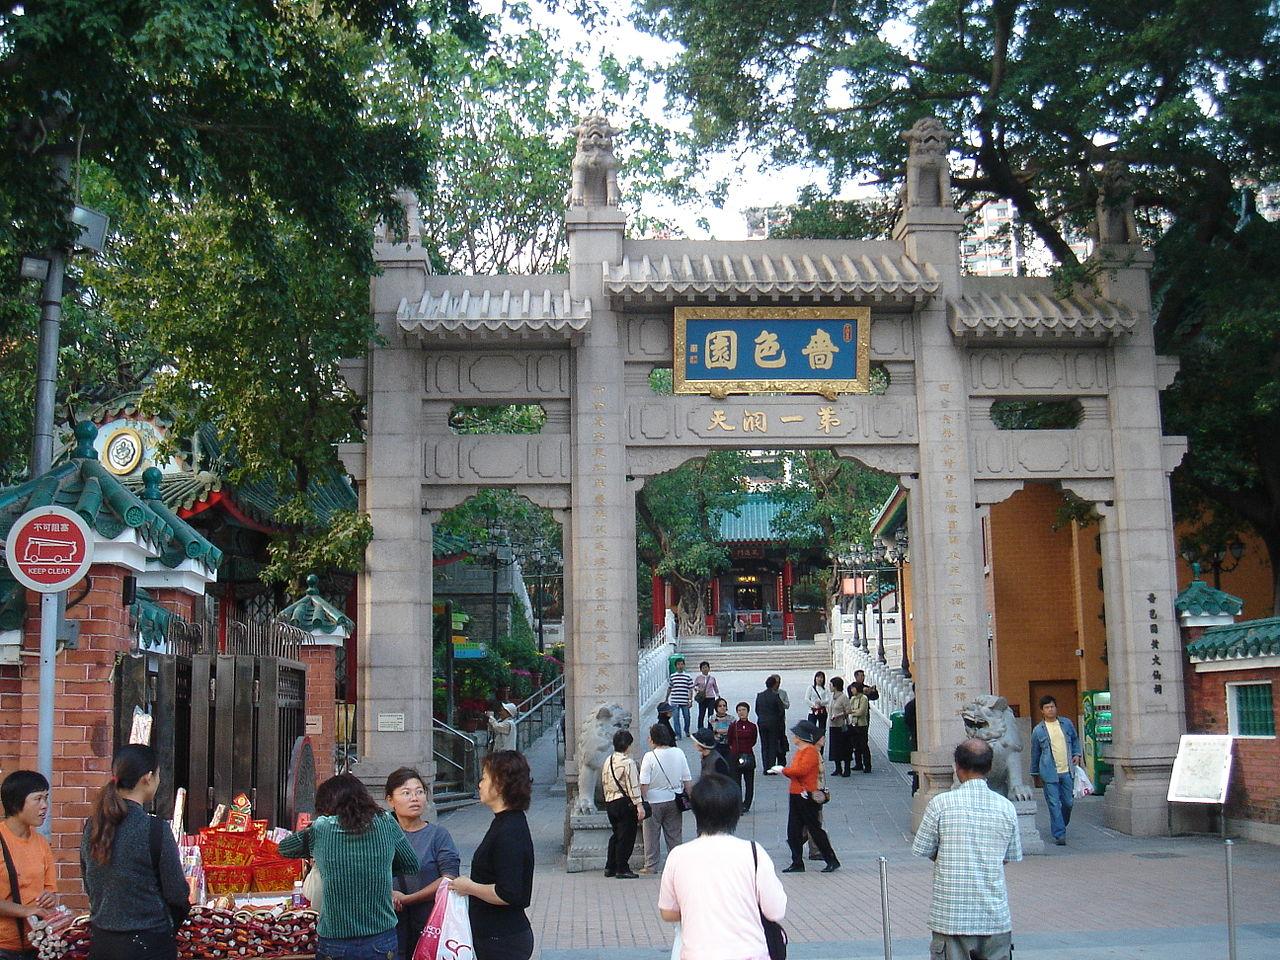 Храм Вонг Тай Син, вход